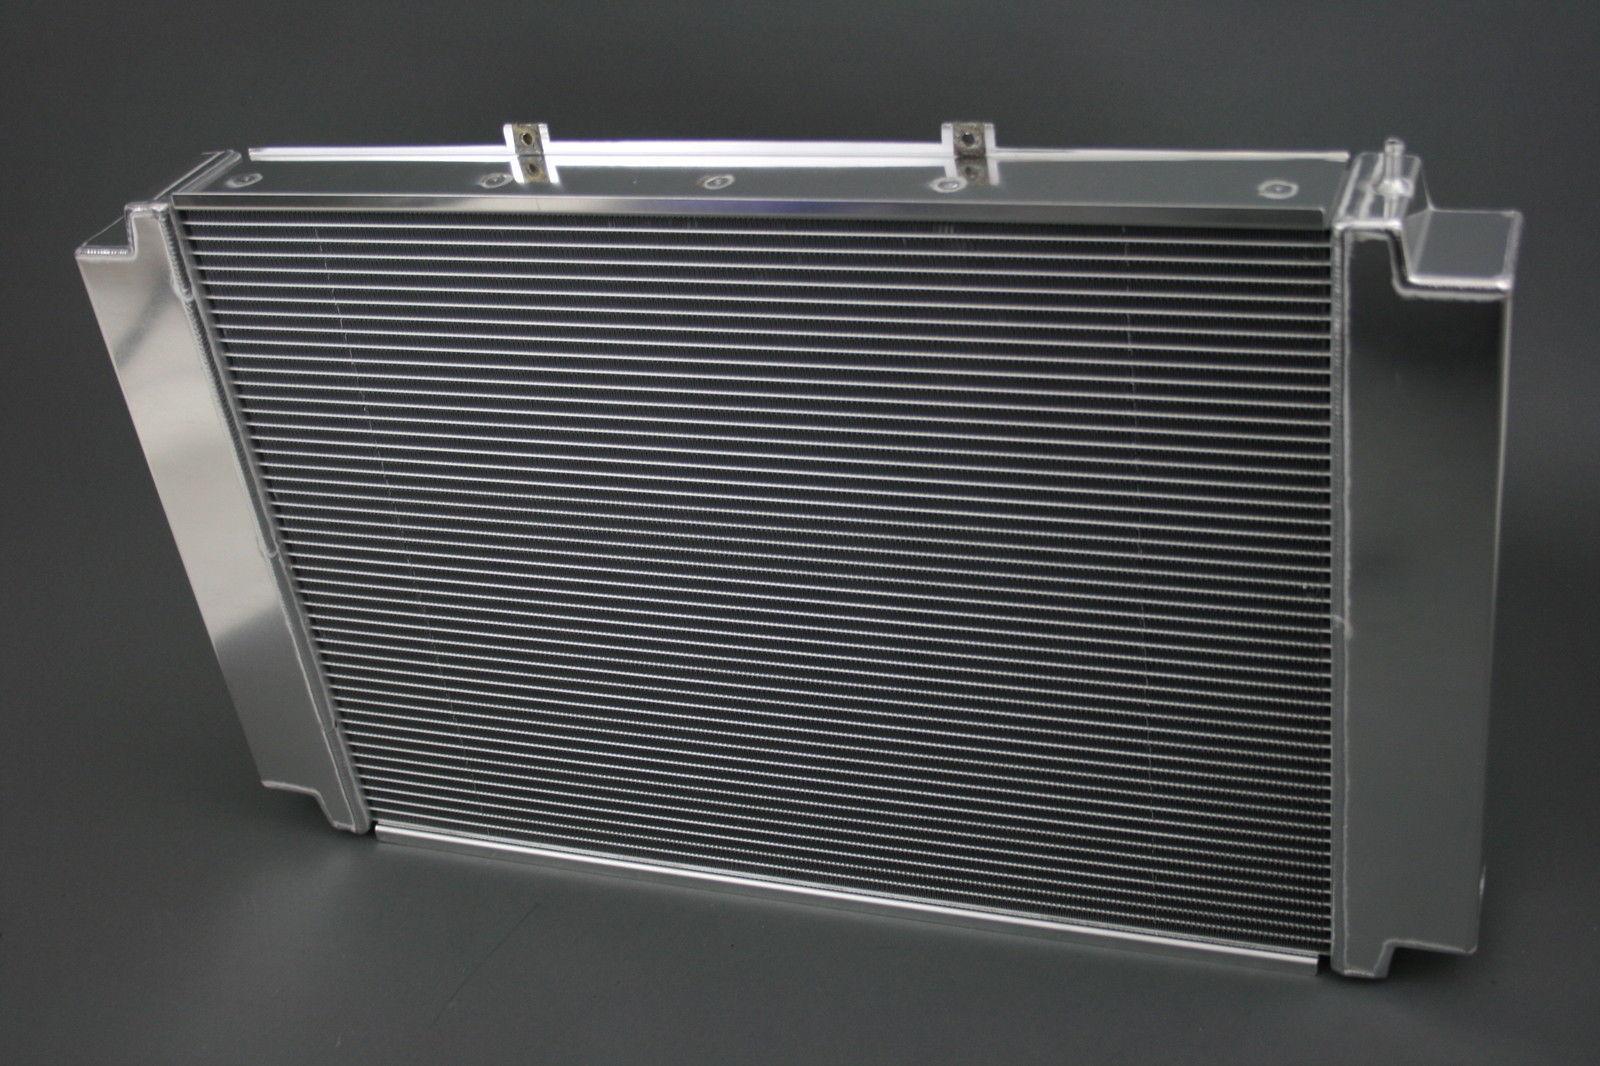 porsche 928 how to replace radiator rennlist. Black Bedroom Furniture Sets. Home Design Ideas